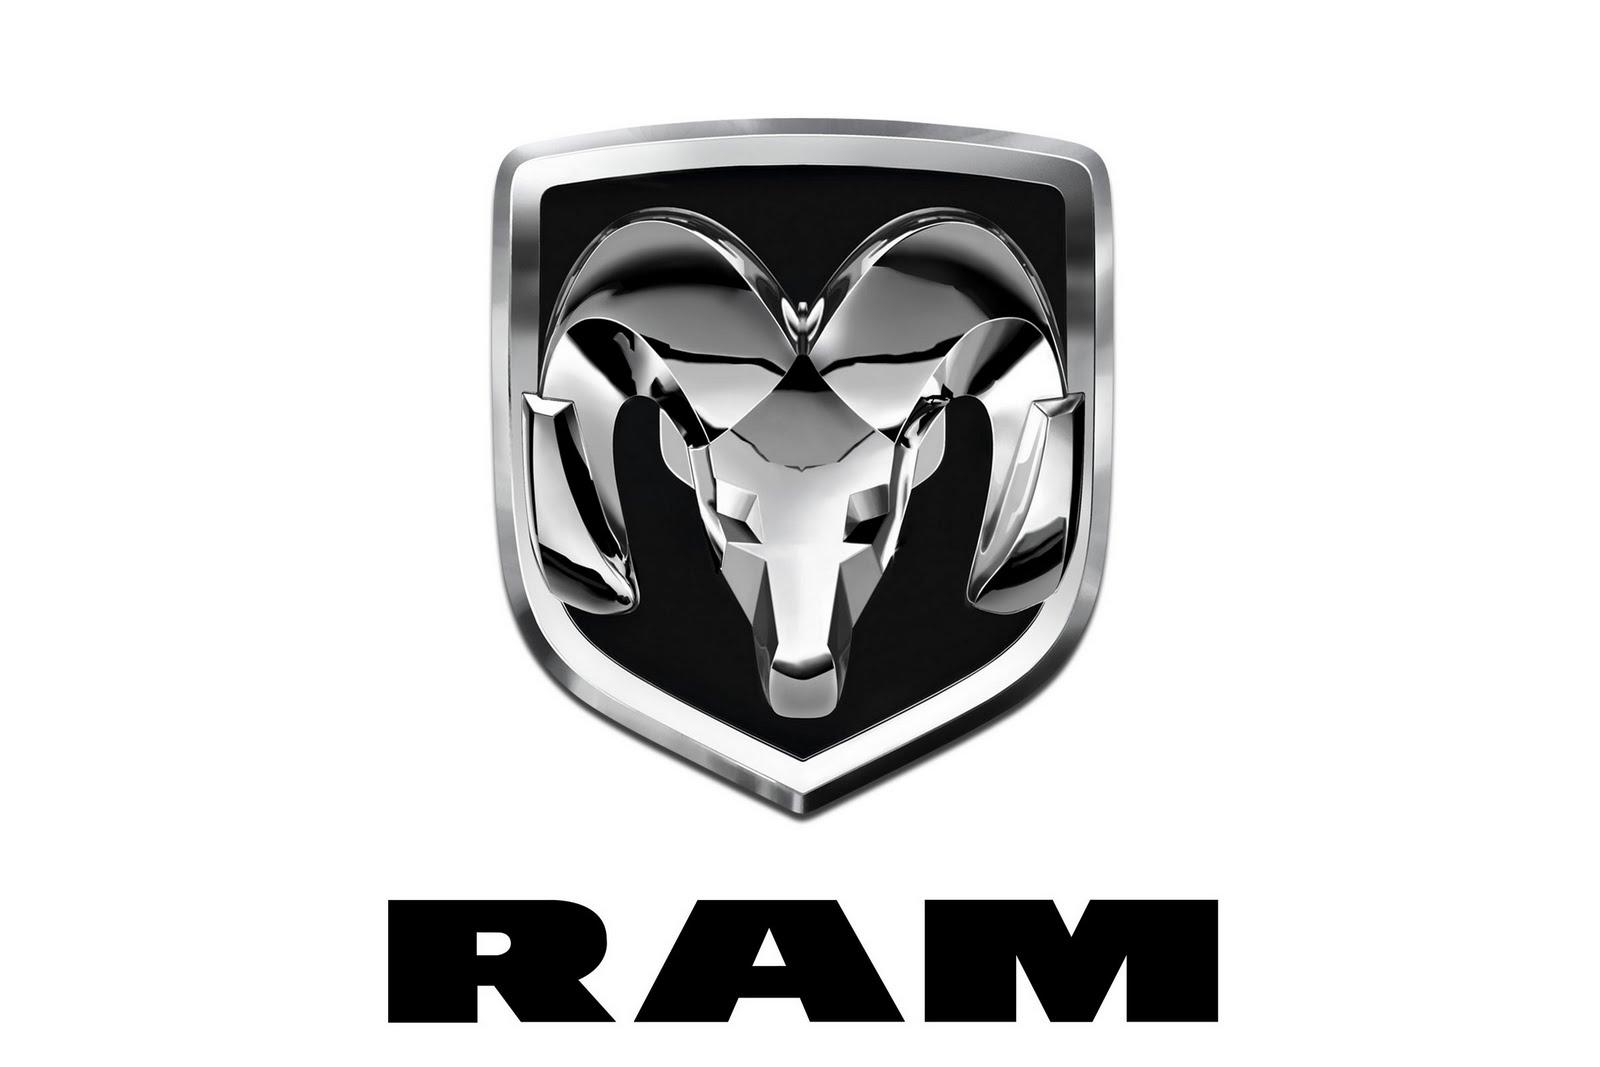 ram logo 2011 ram logo dodge ram logo web ram logo low resolution ram 1600x1067